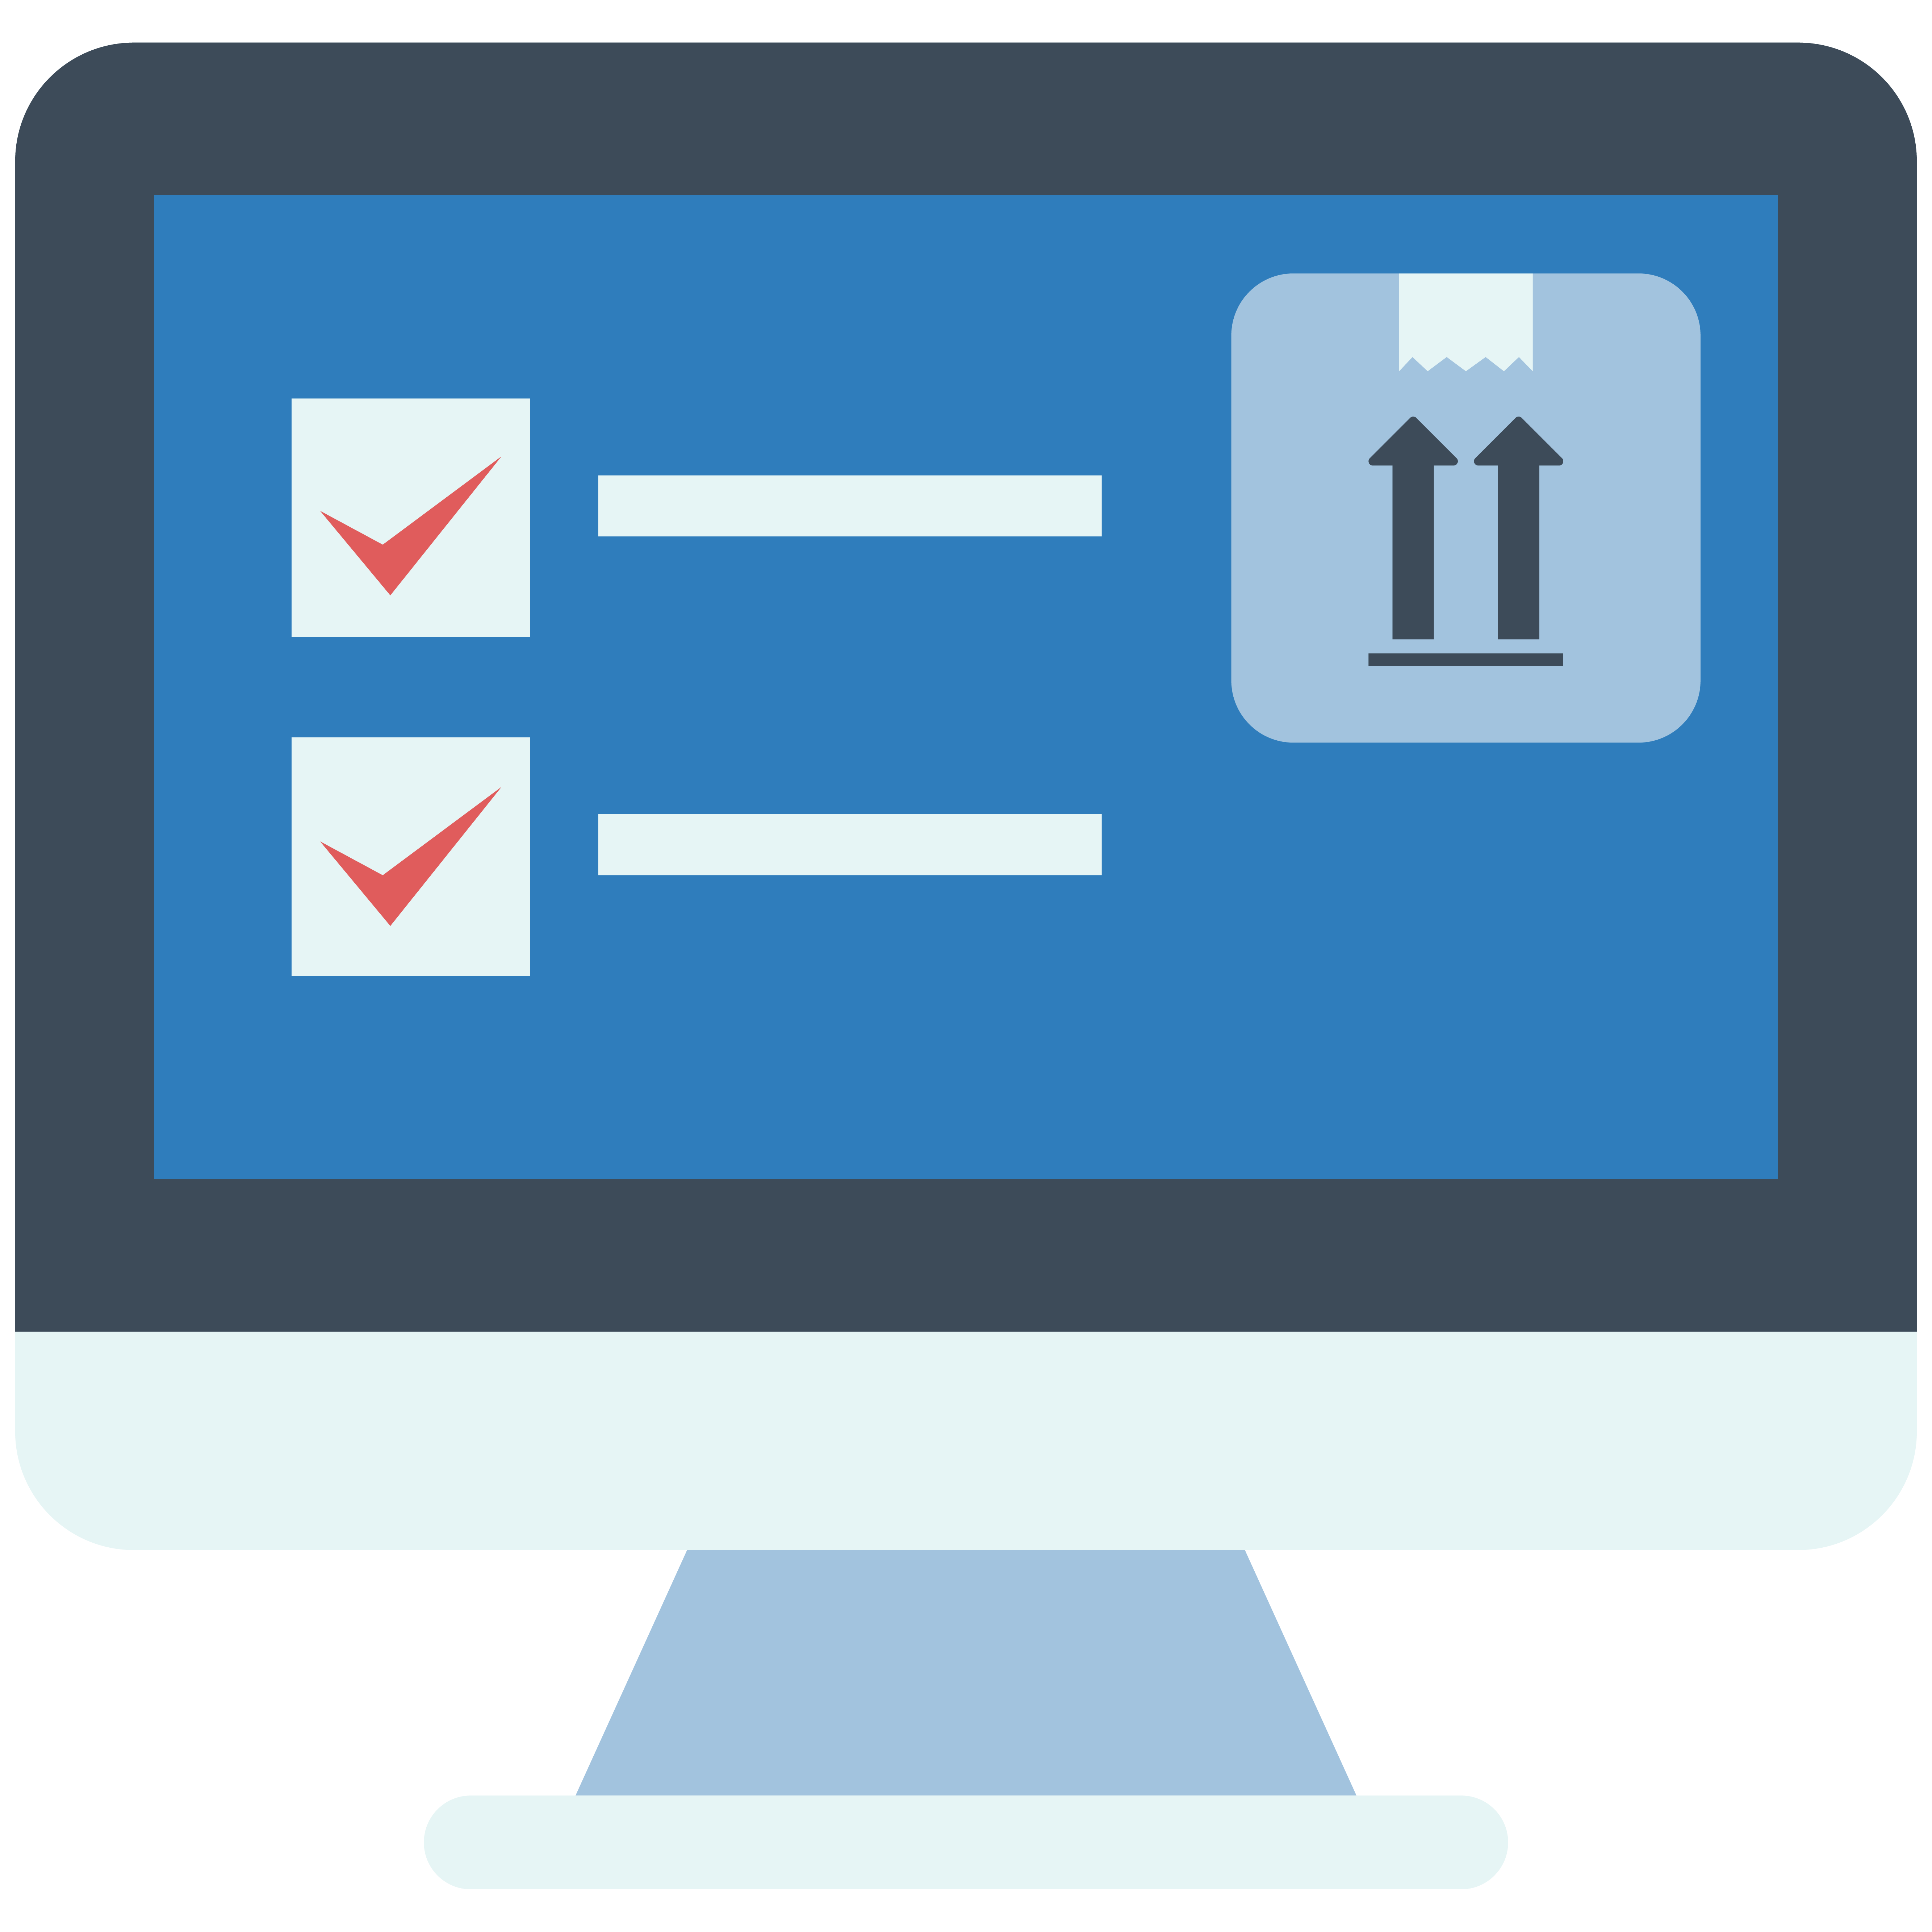 71lbs_Brand_Icons_Status - Dashboard (1)